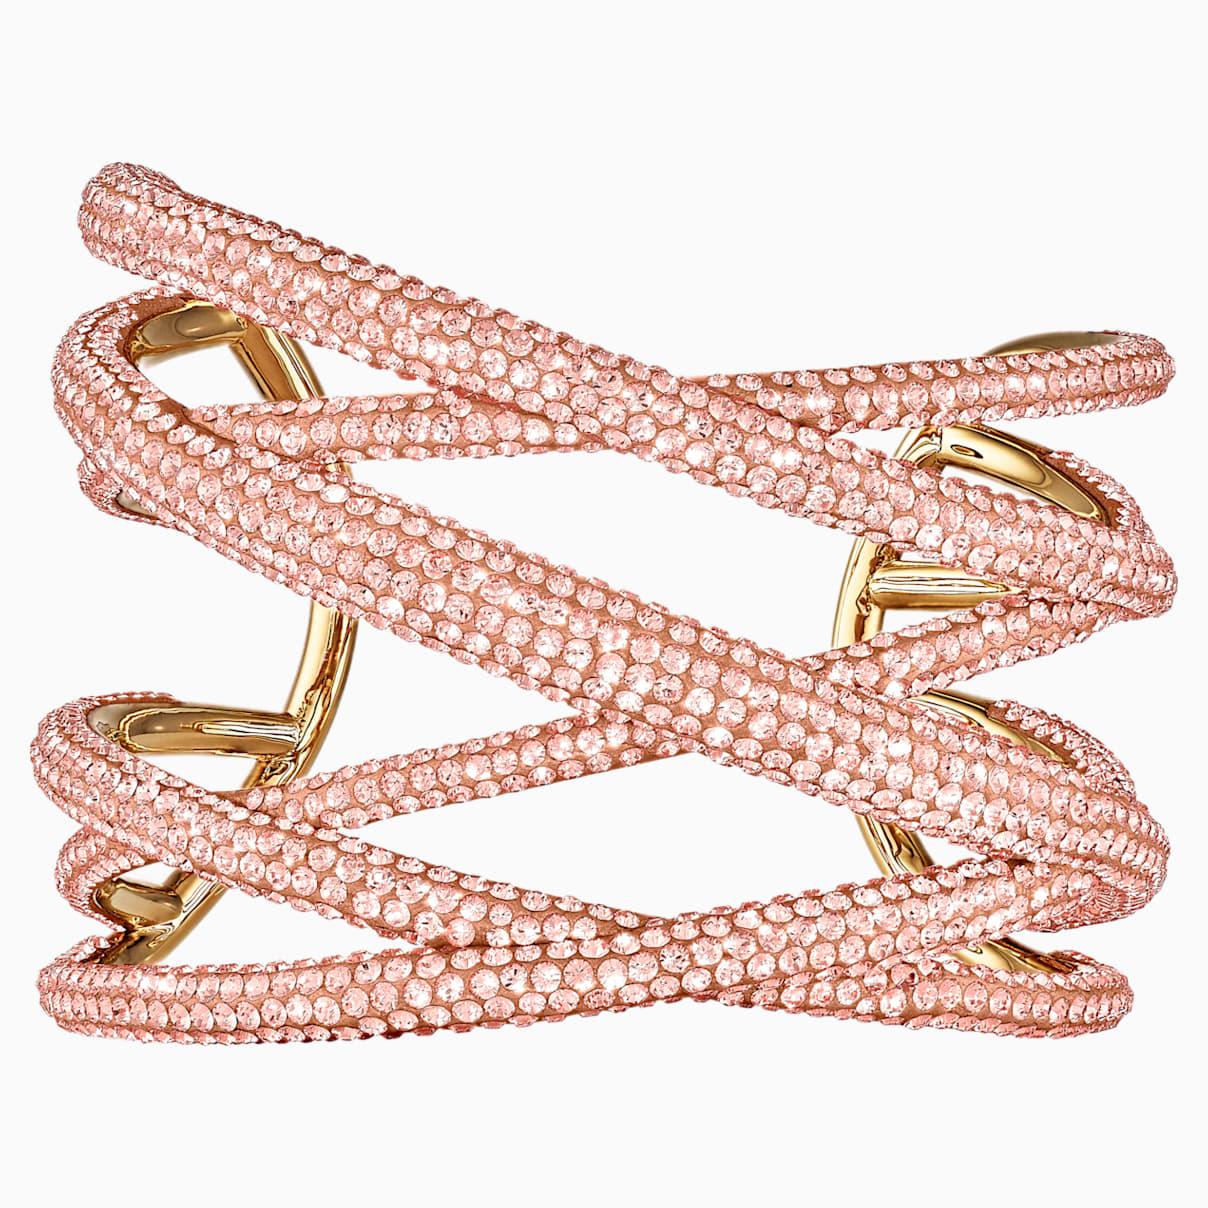 Tigris Armreif, groß, rosa, vergoldet